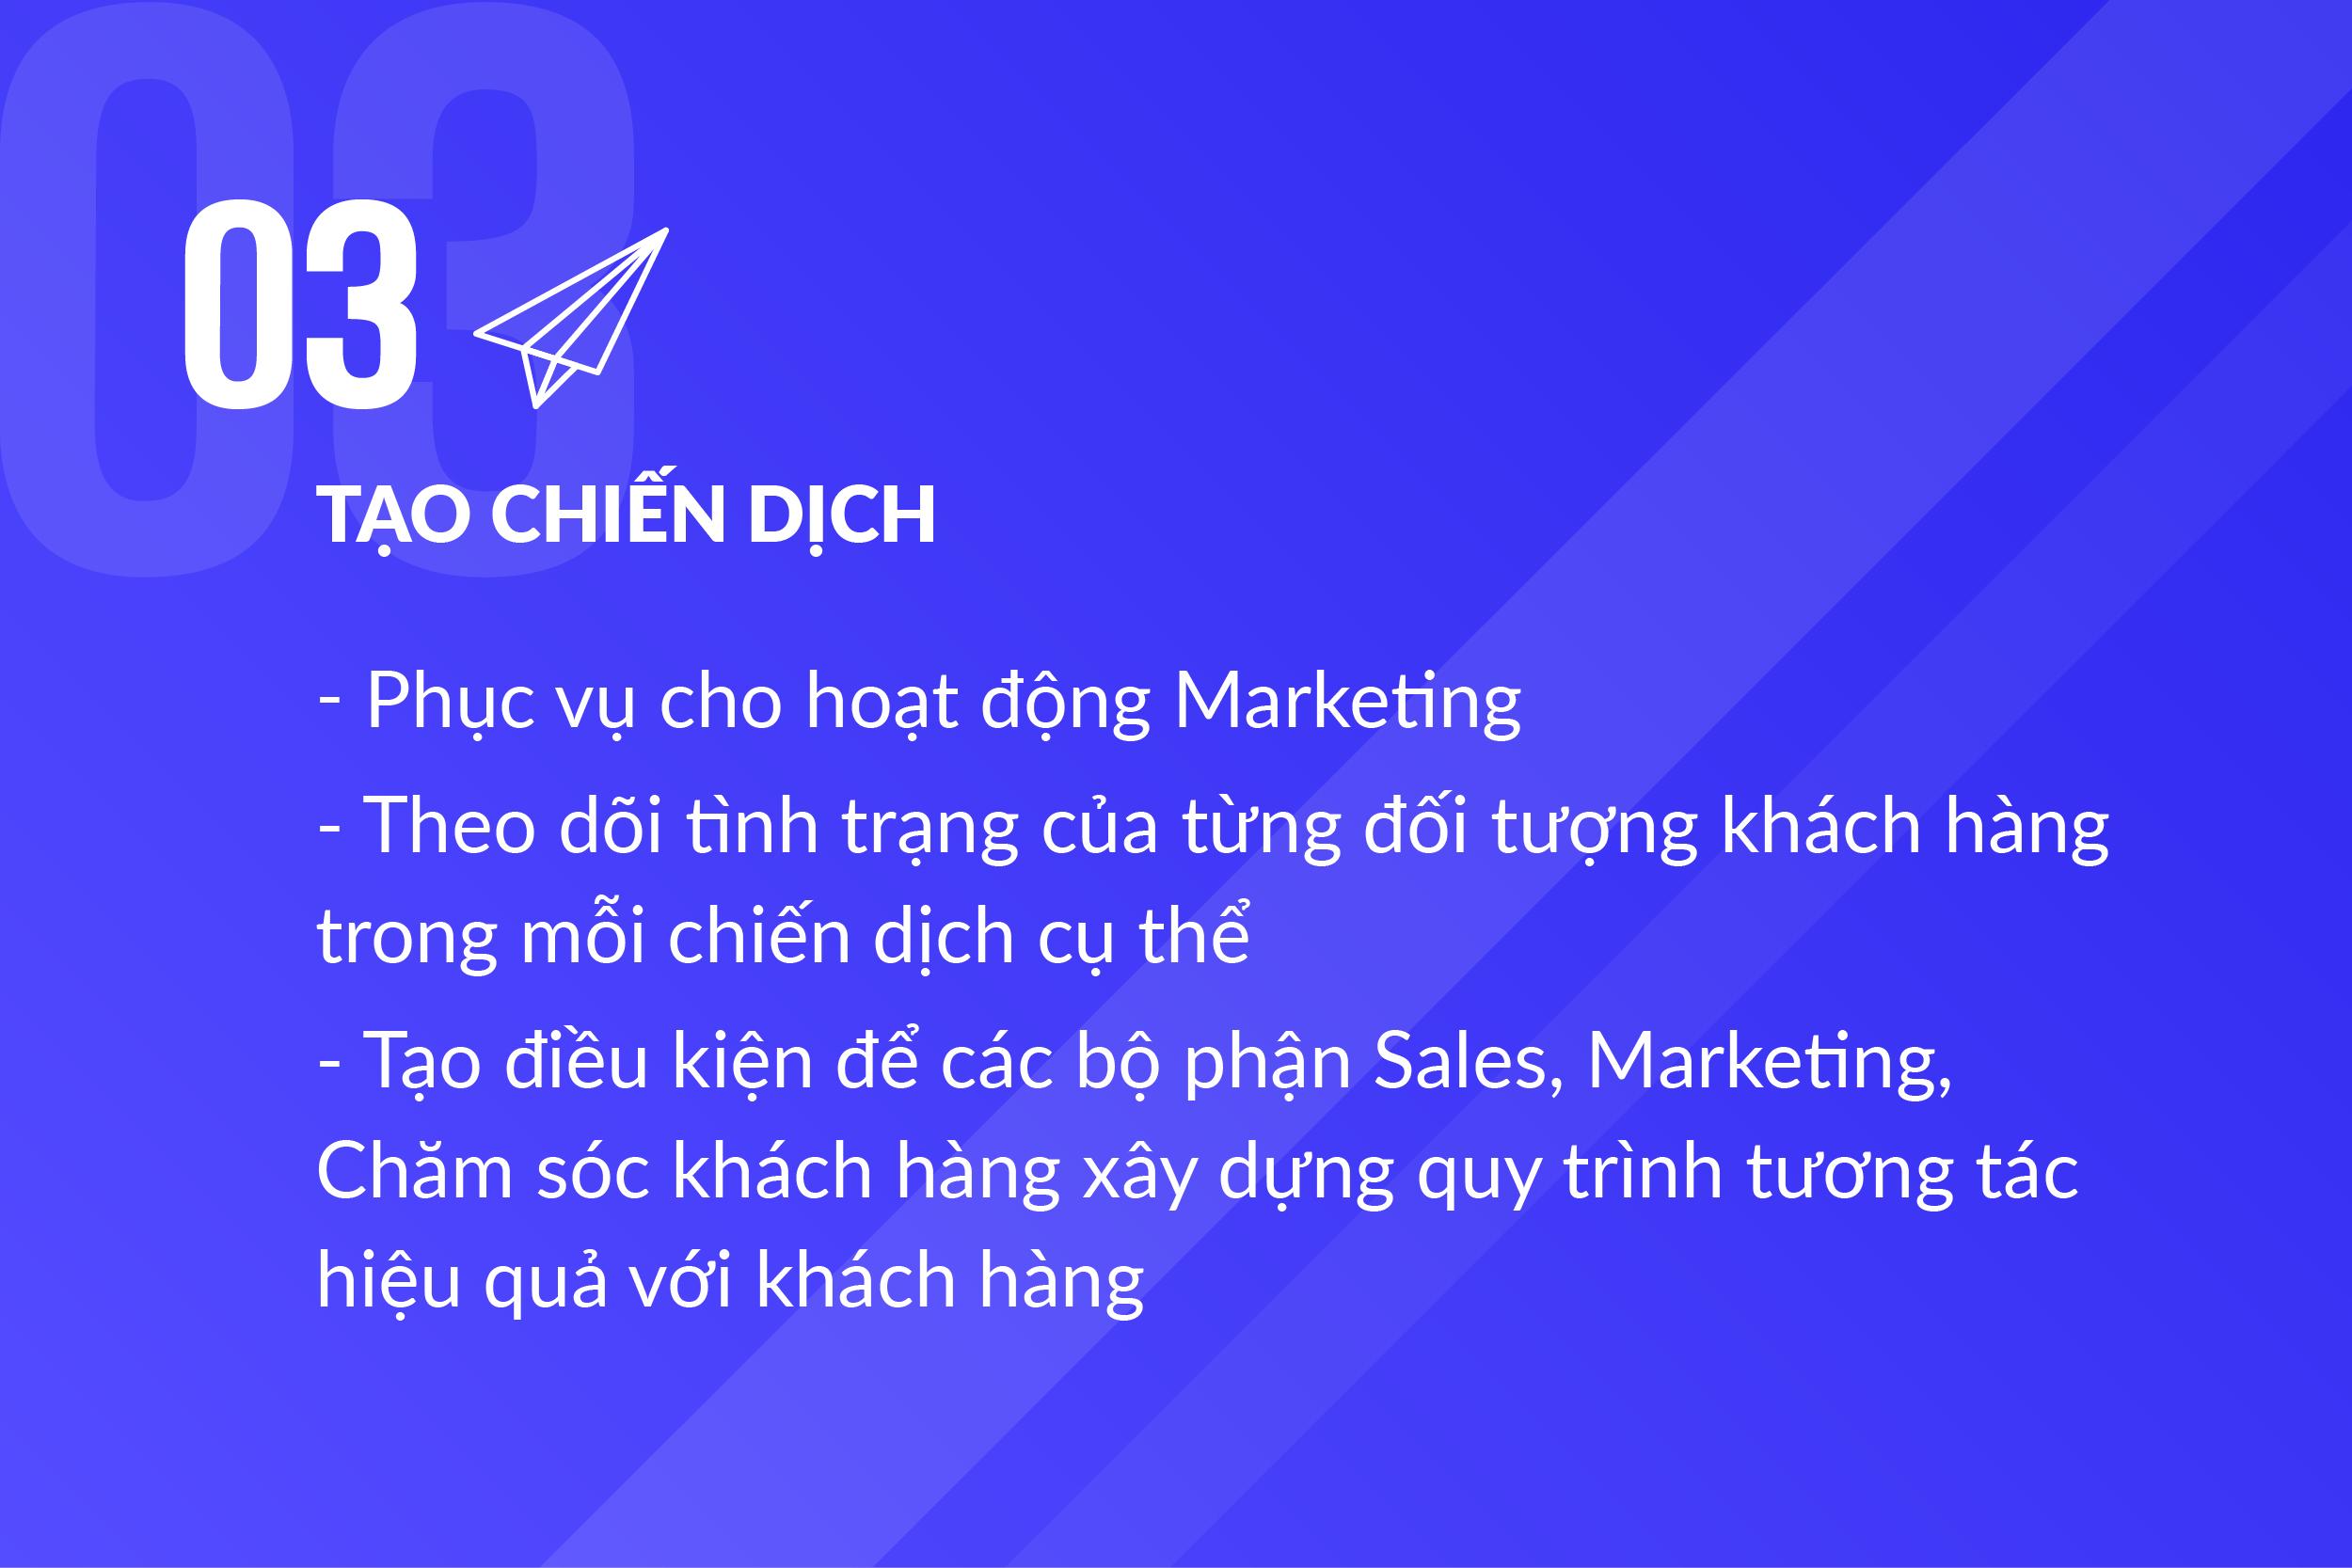 tao-chien-dich-marketing